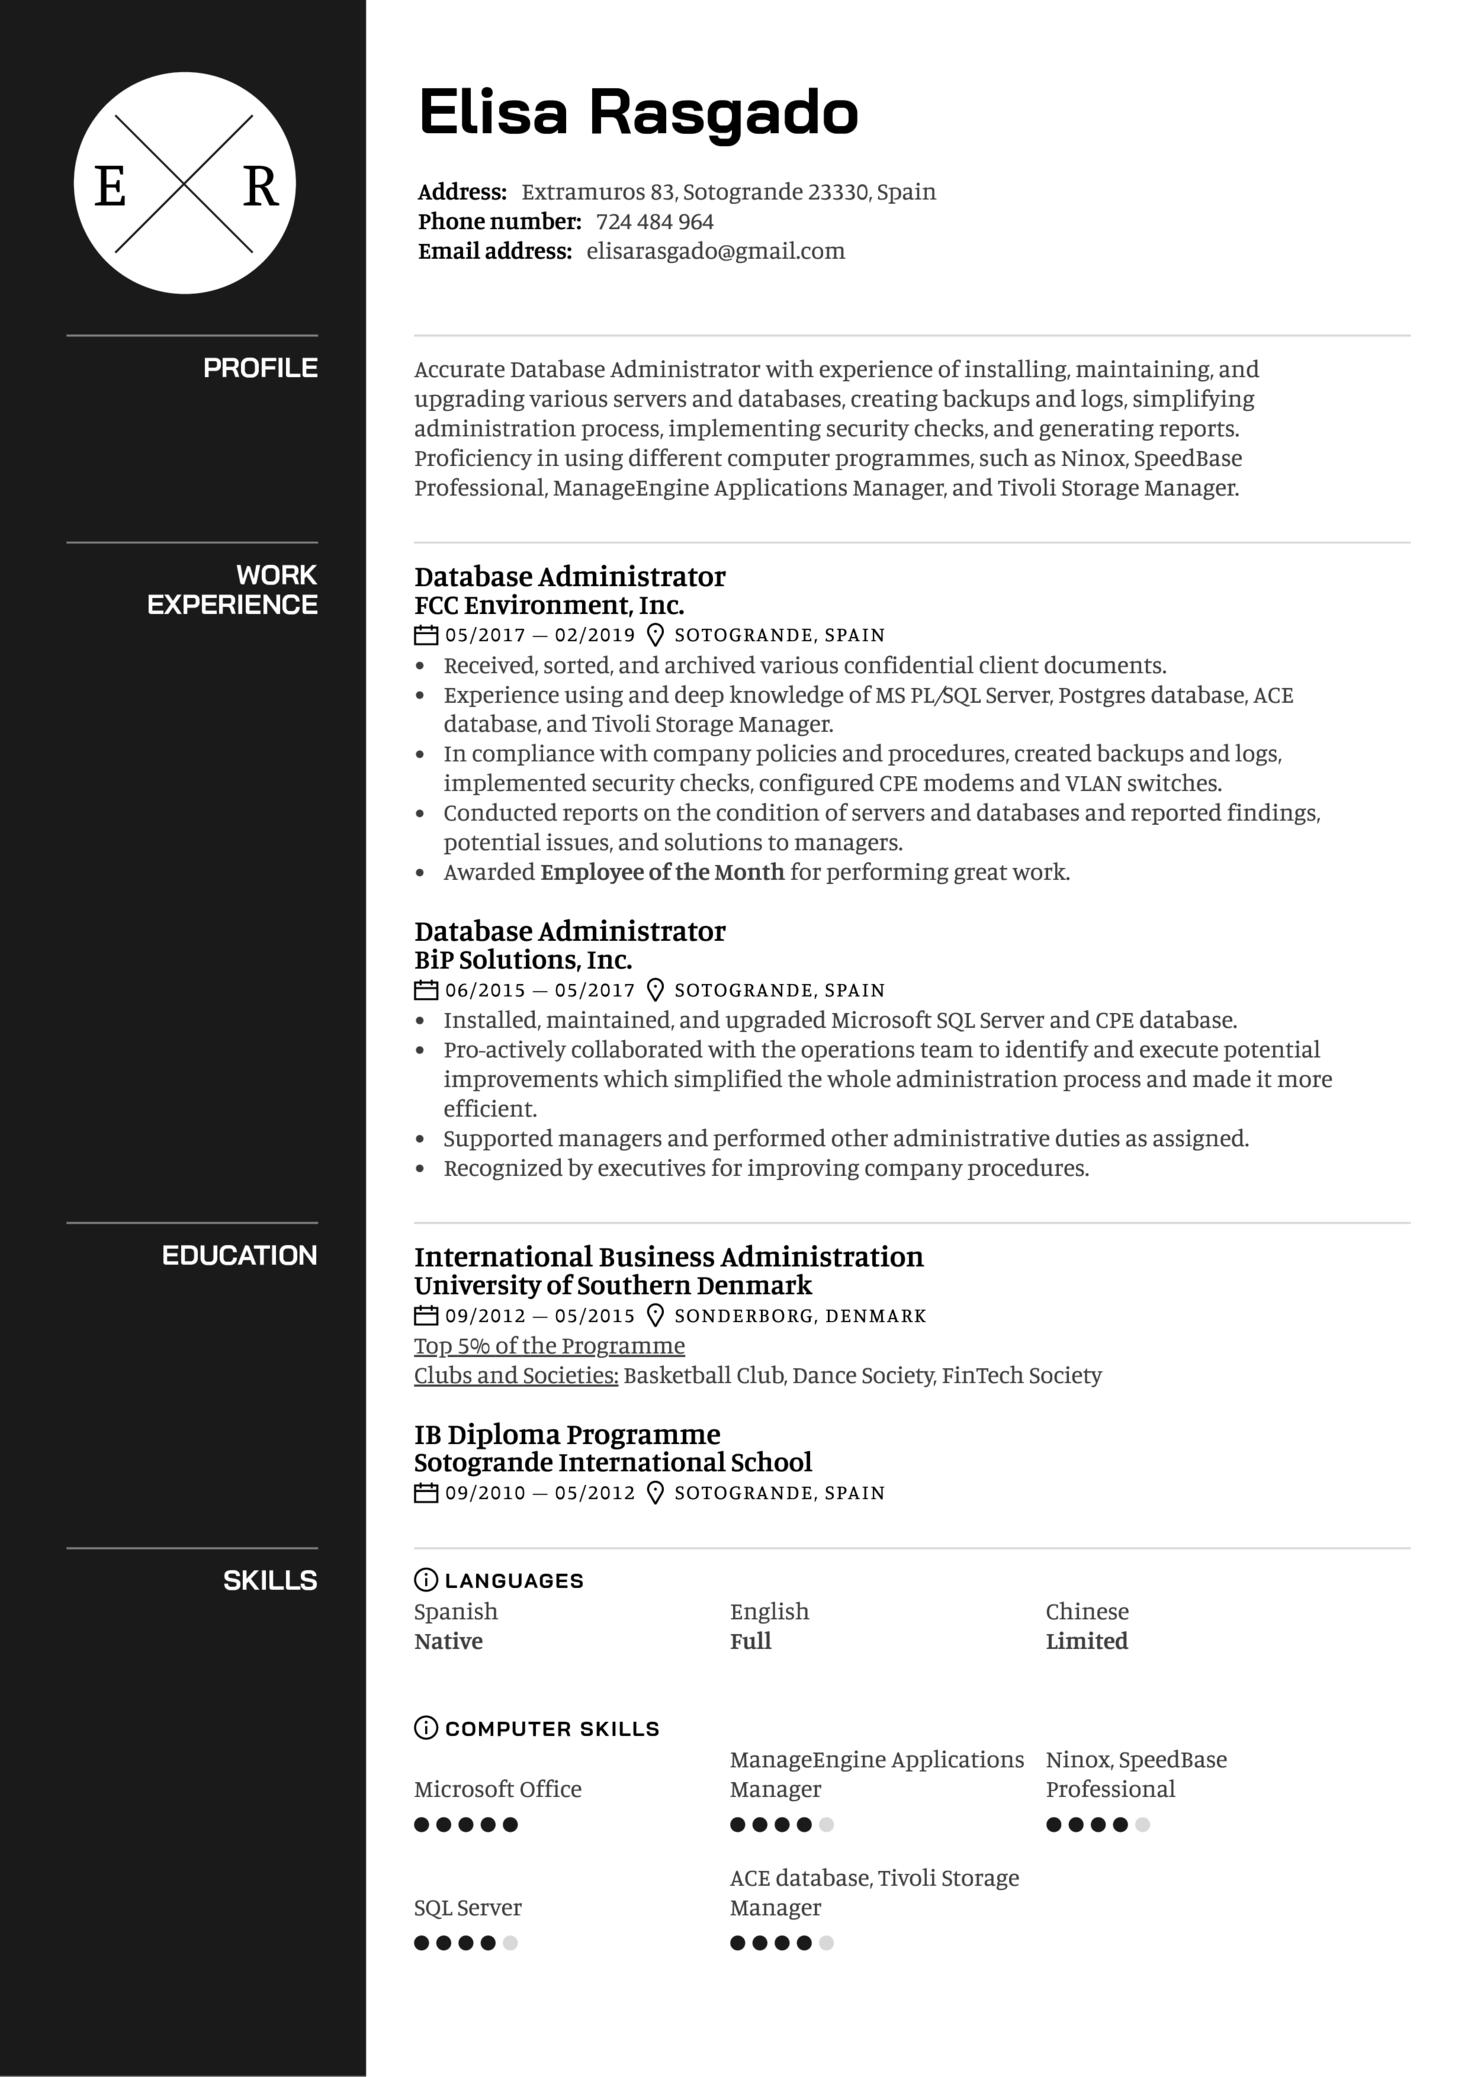 Database Administrator Resume Example (parte 1)